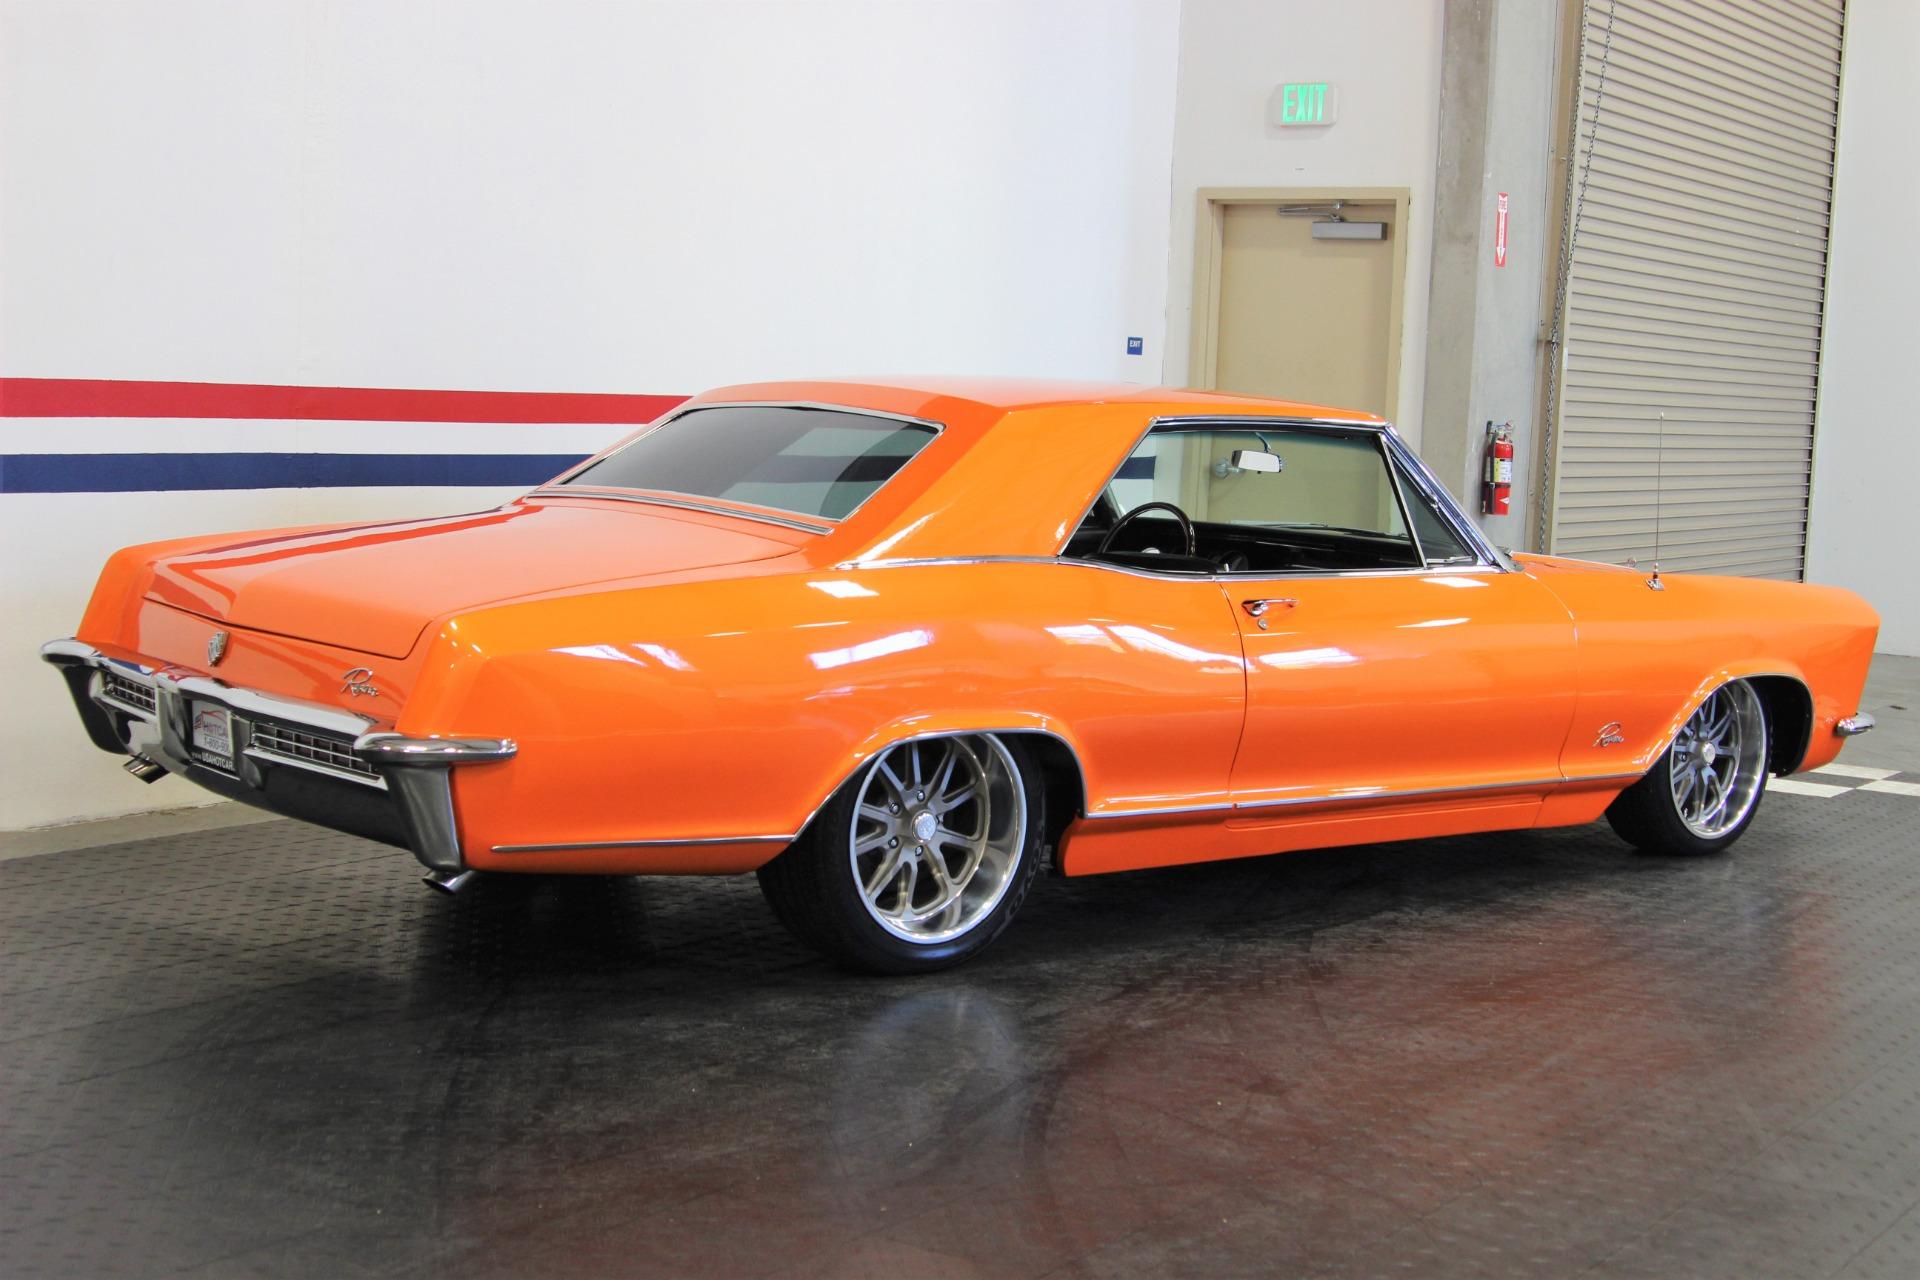 Used-1965-Buick-Riviera